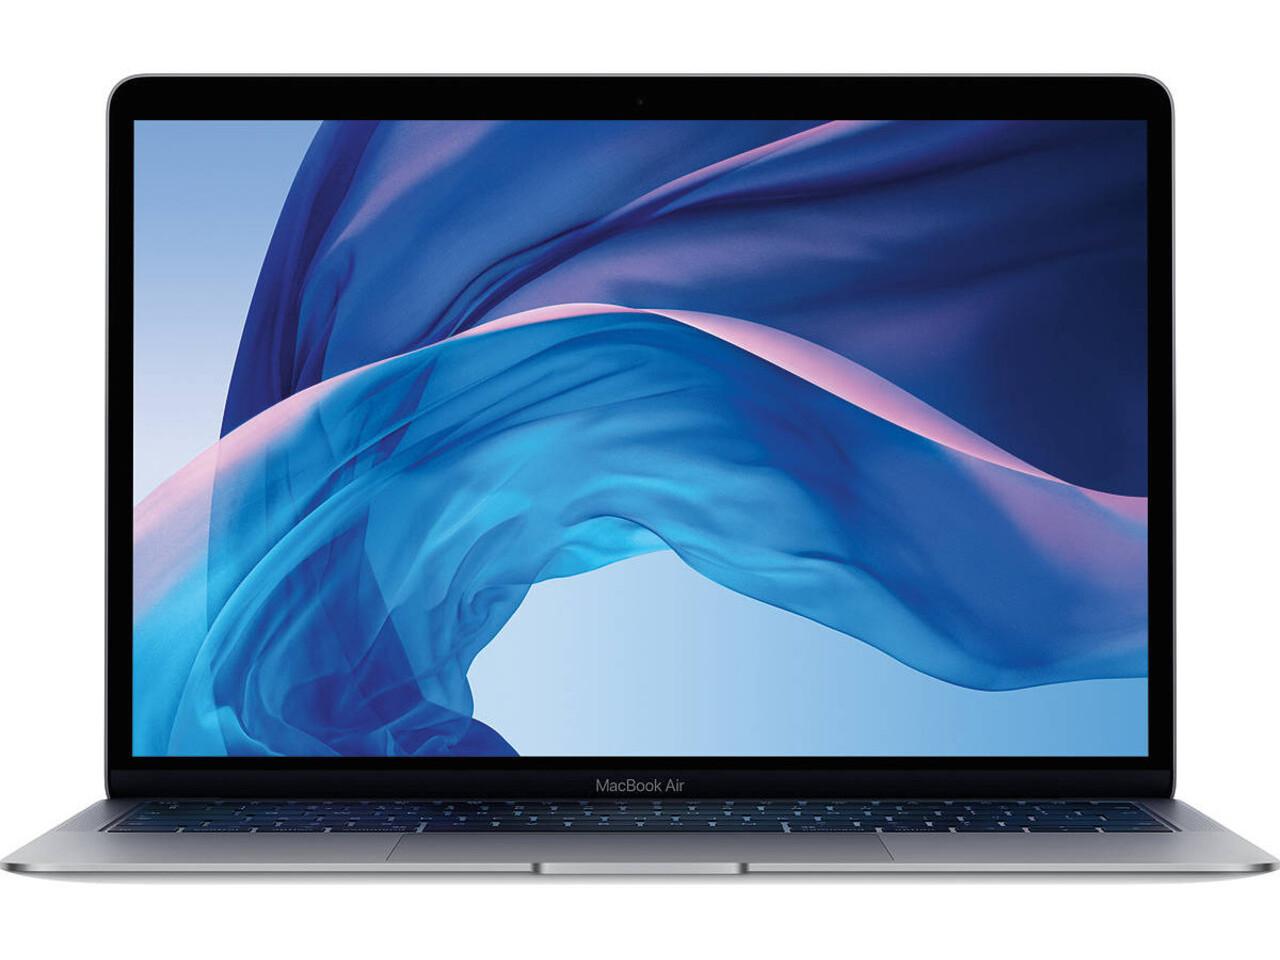 macbook air 13 inch 2018 space gray